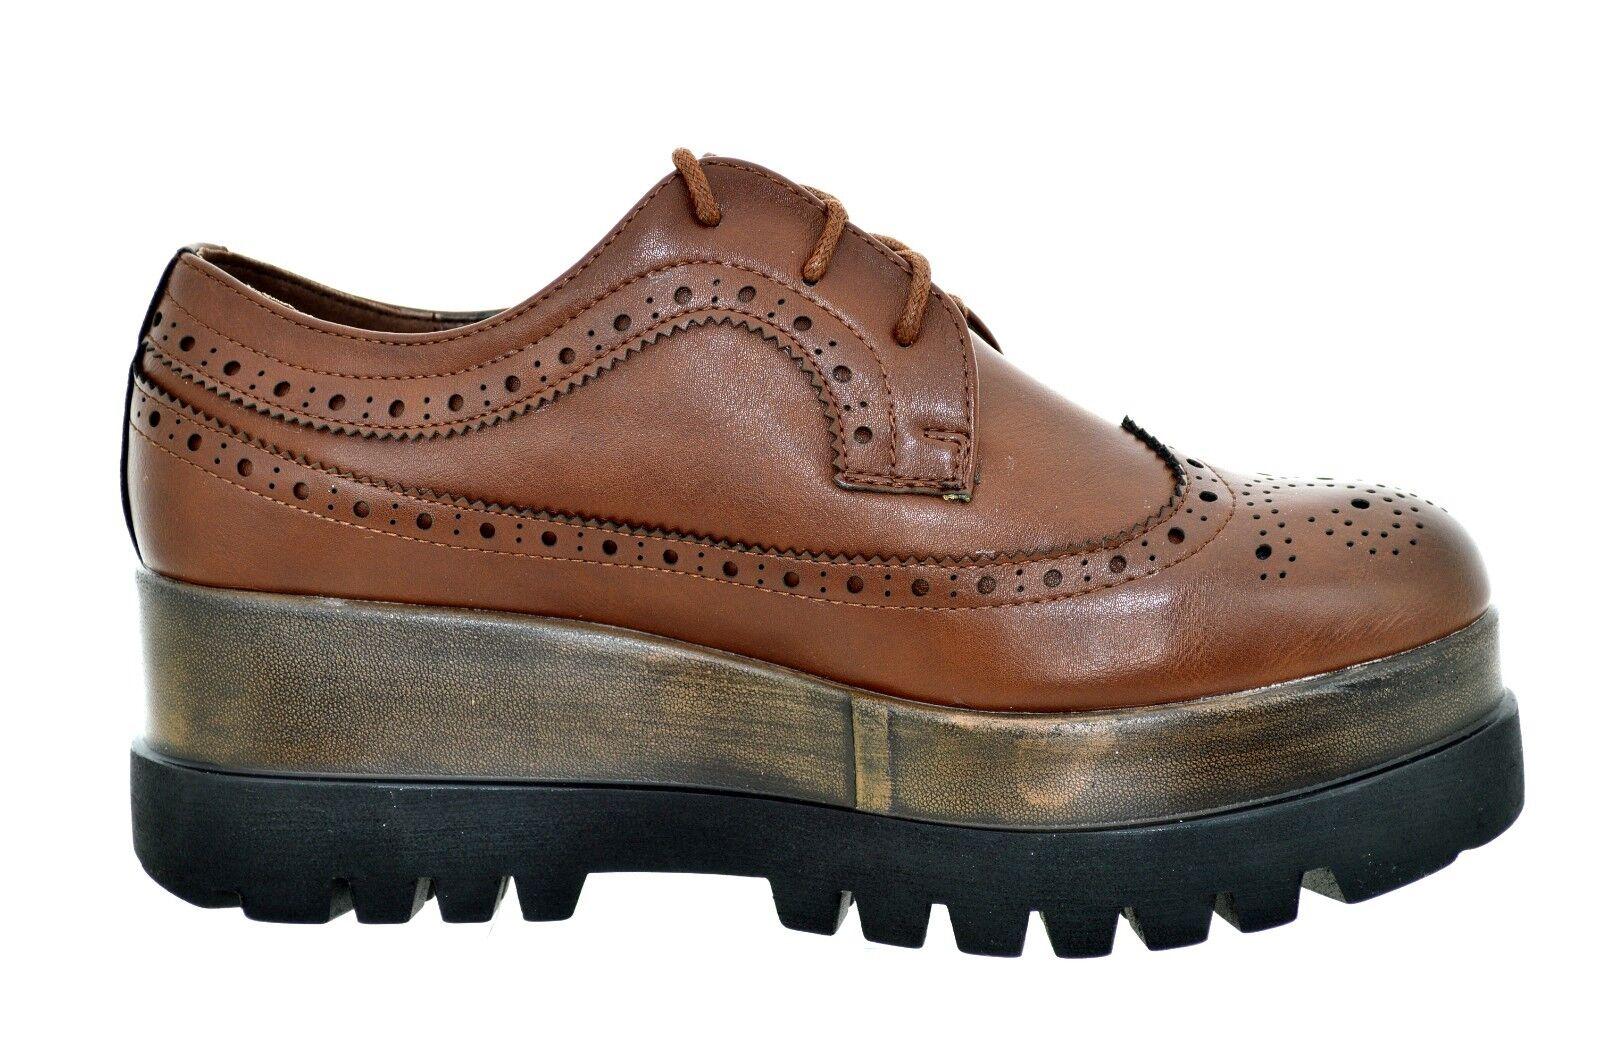 a514e7b3ea5b94 Scarpe donna inglesina platform marroni sneakers con zeppa francesine  invernali